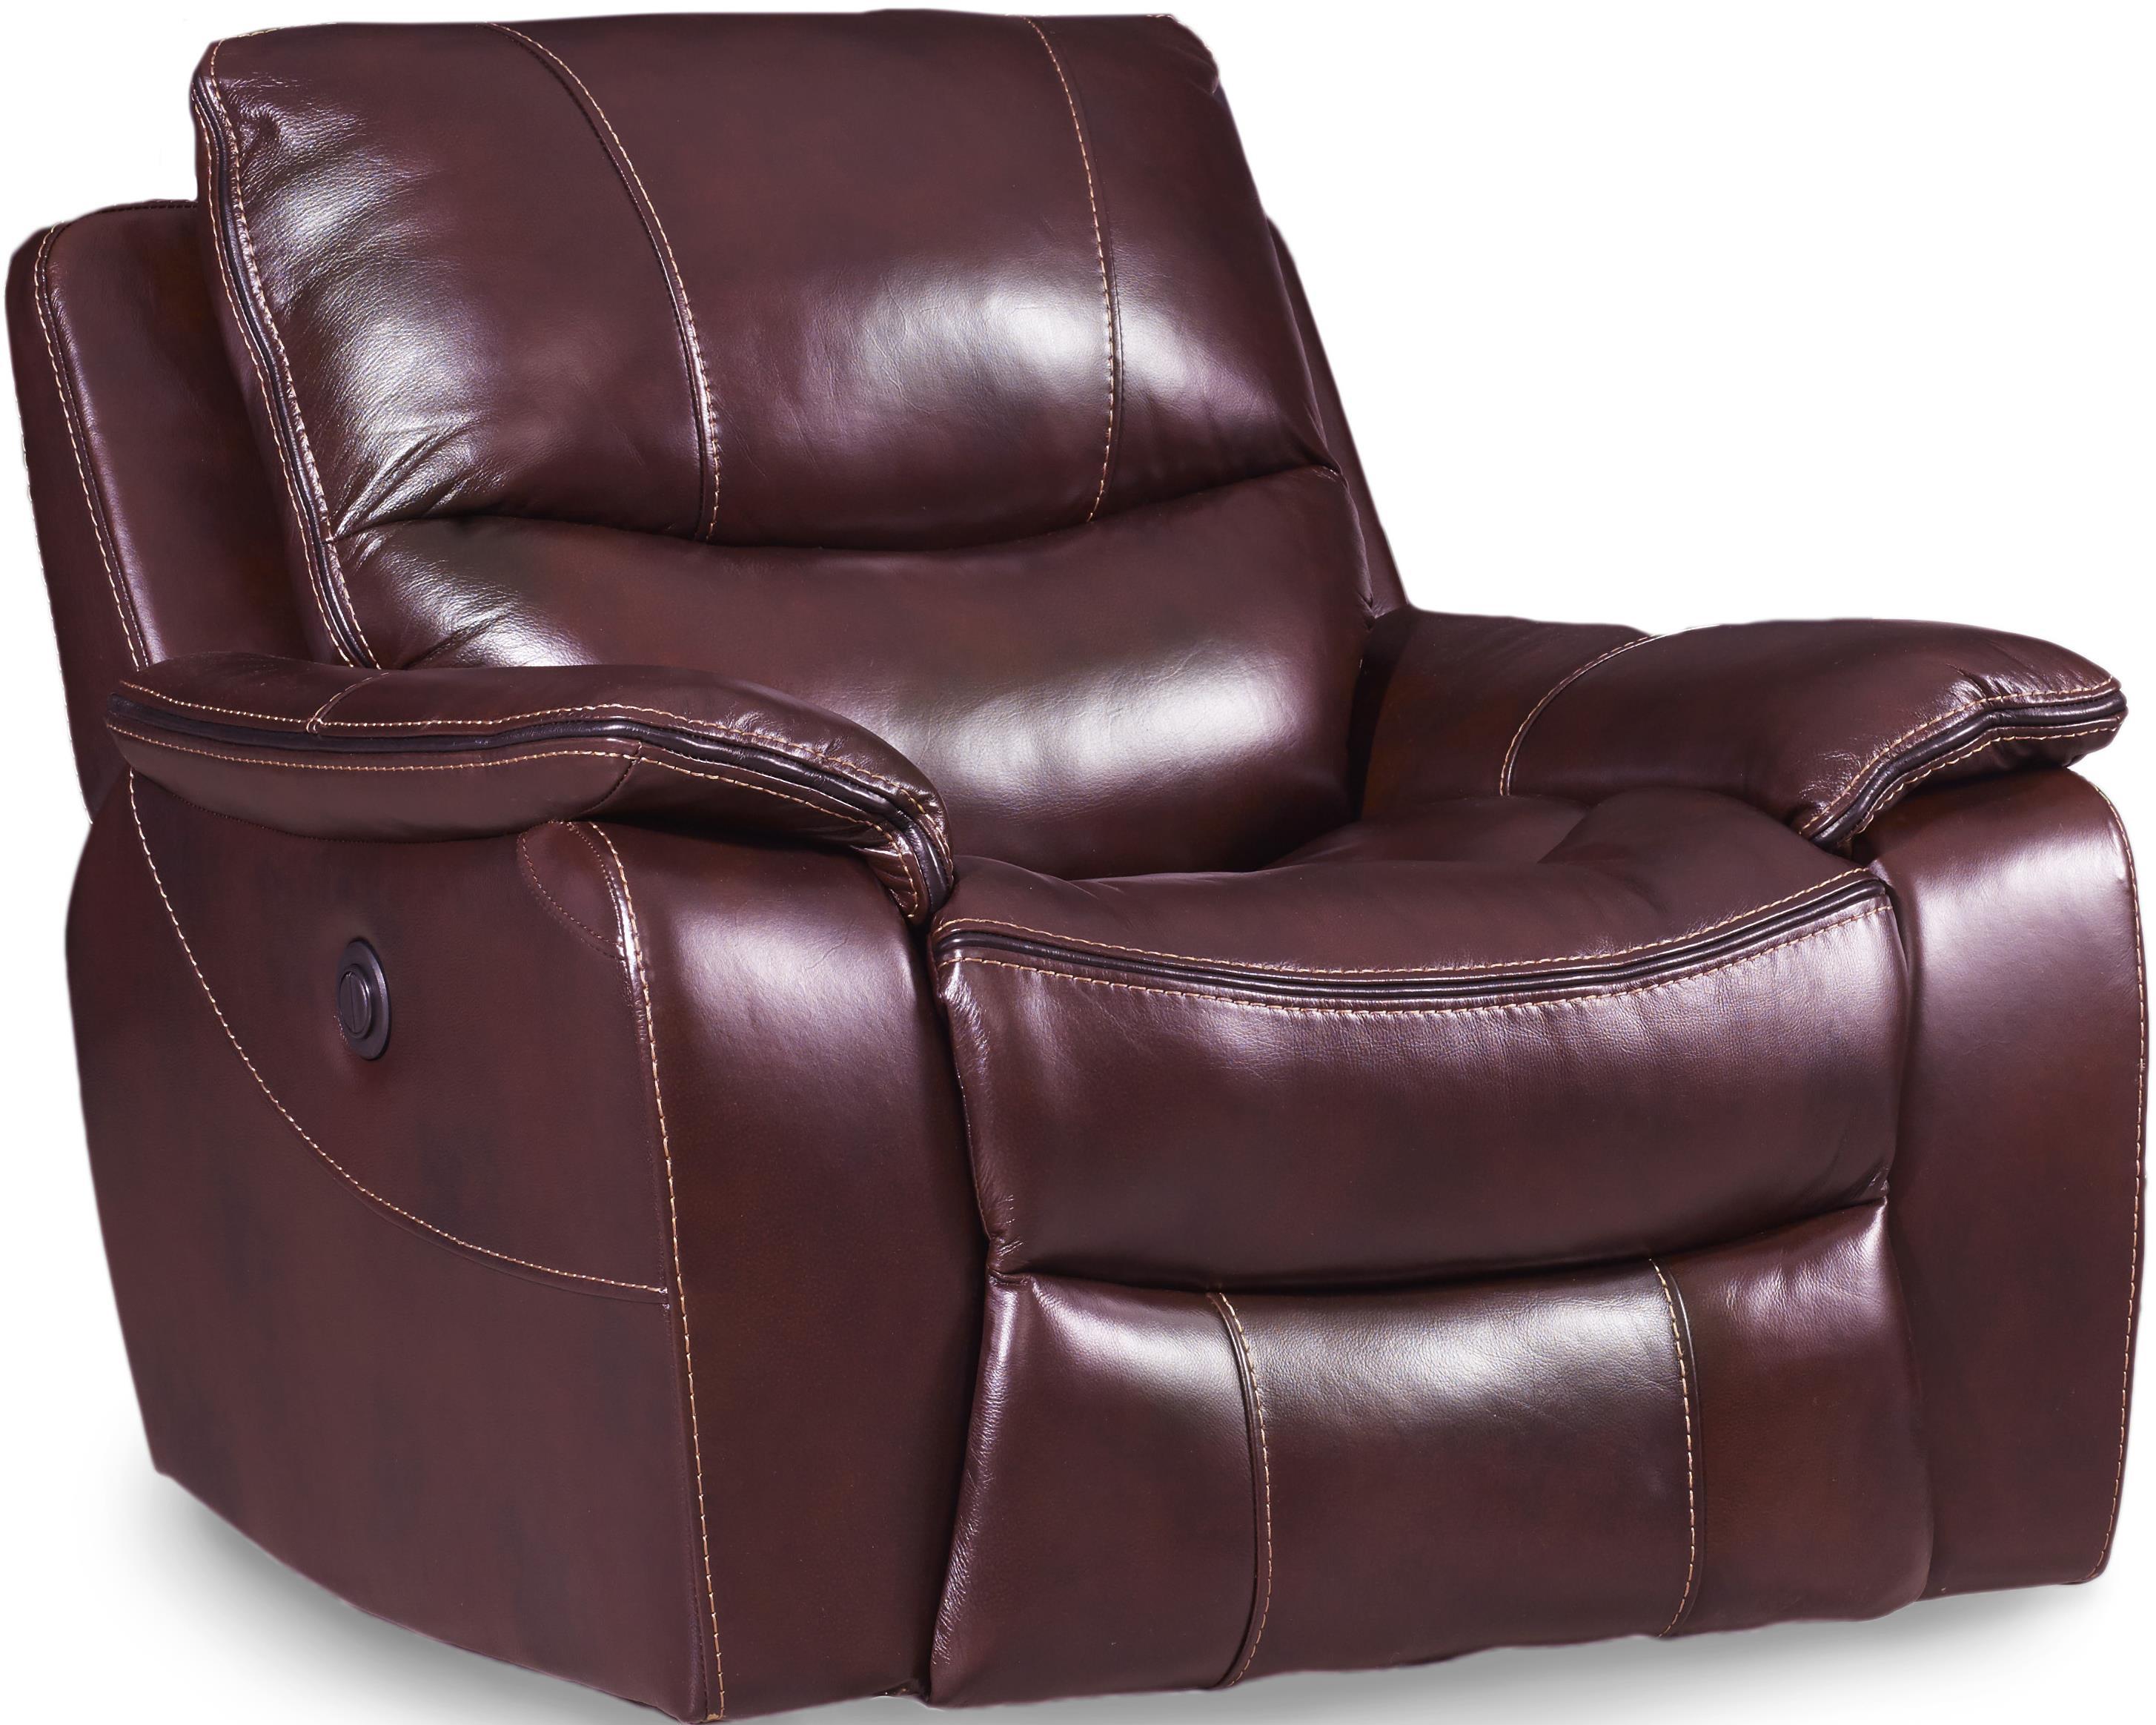 Hooker Furniture Oxford Power Glider Recliner - Item Number: SS624-P1G-069